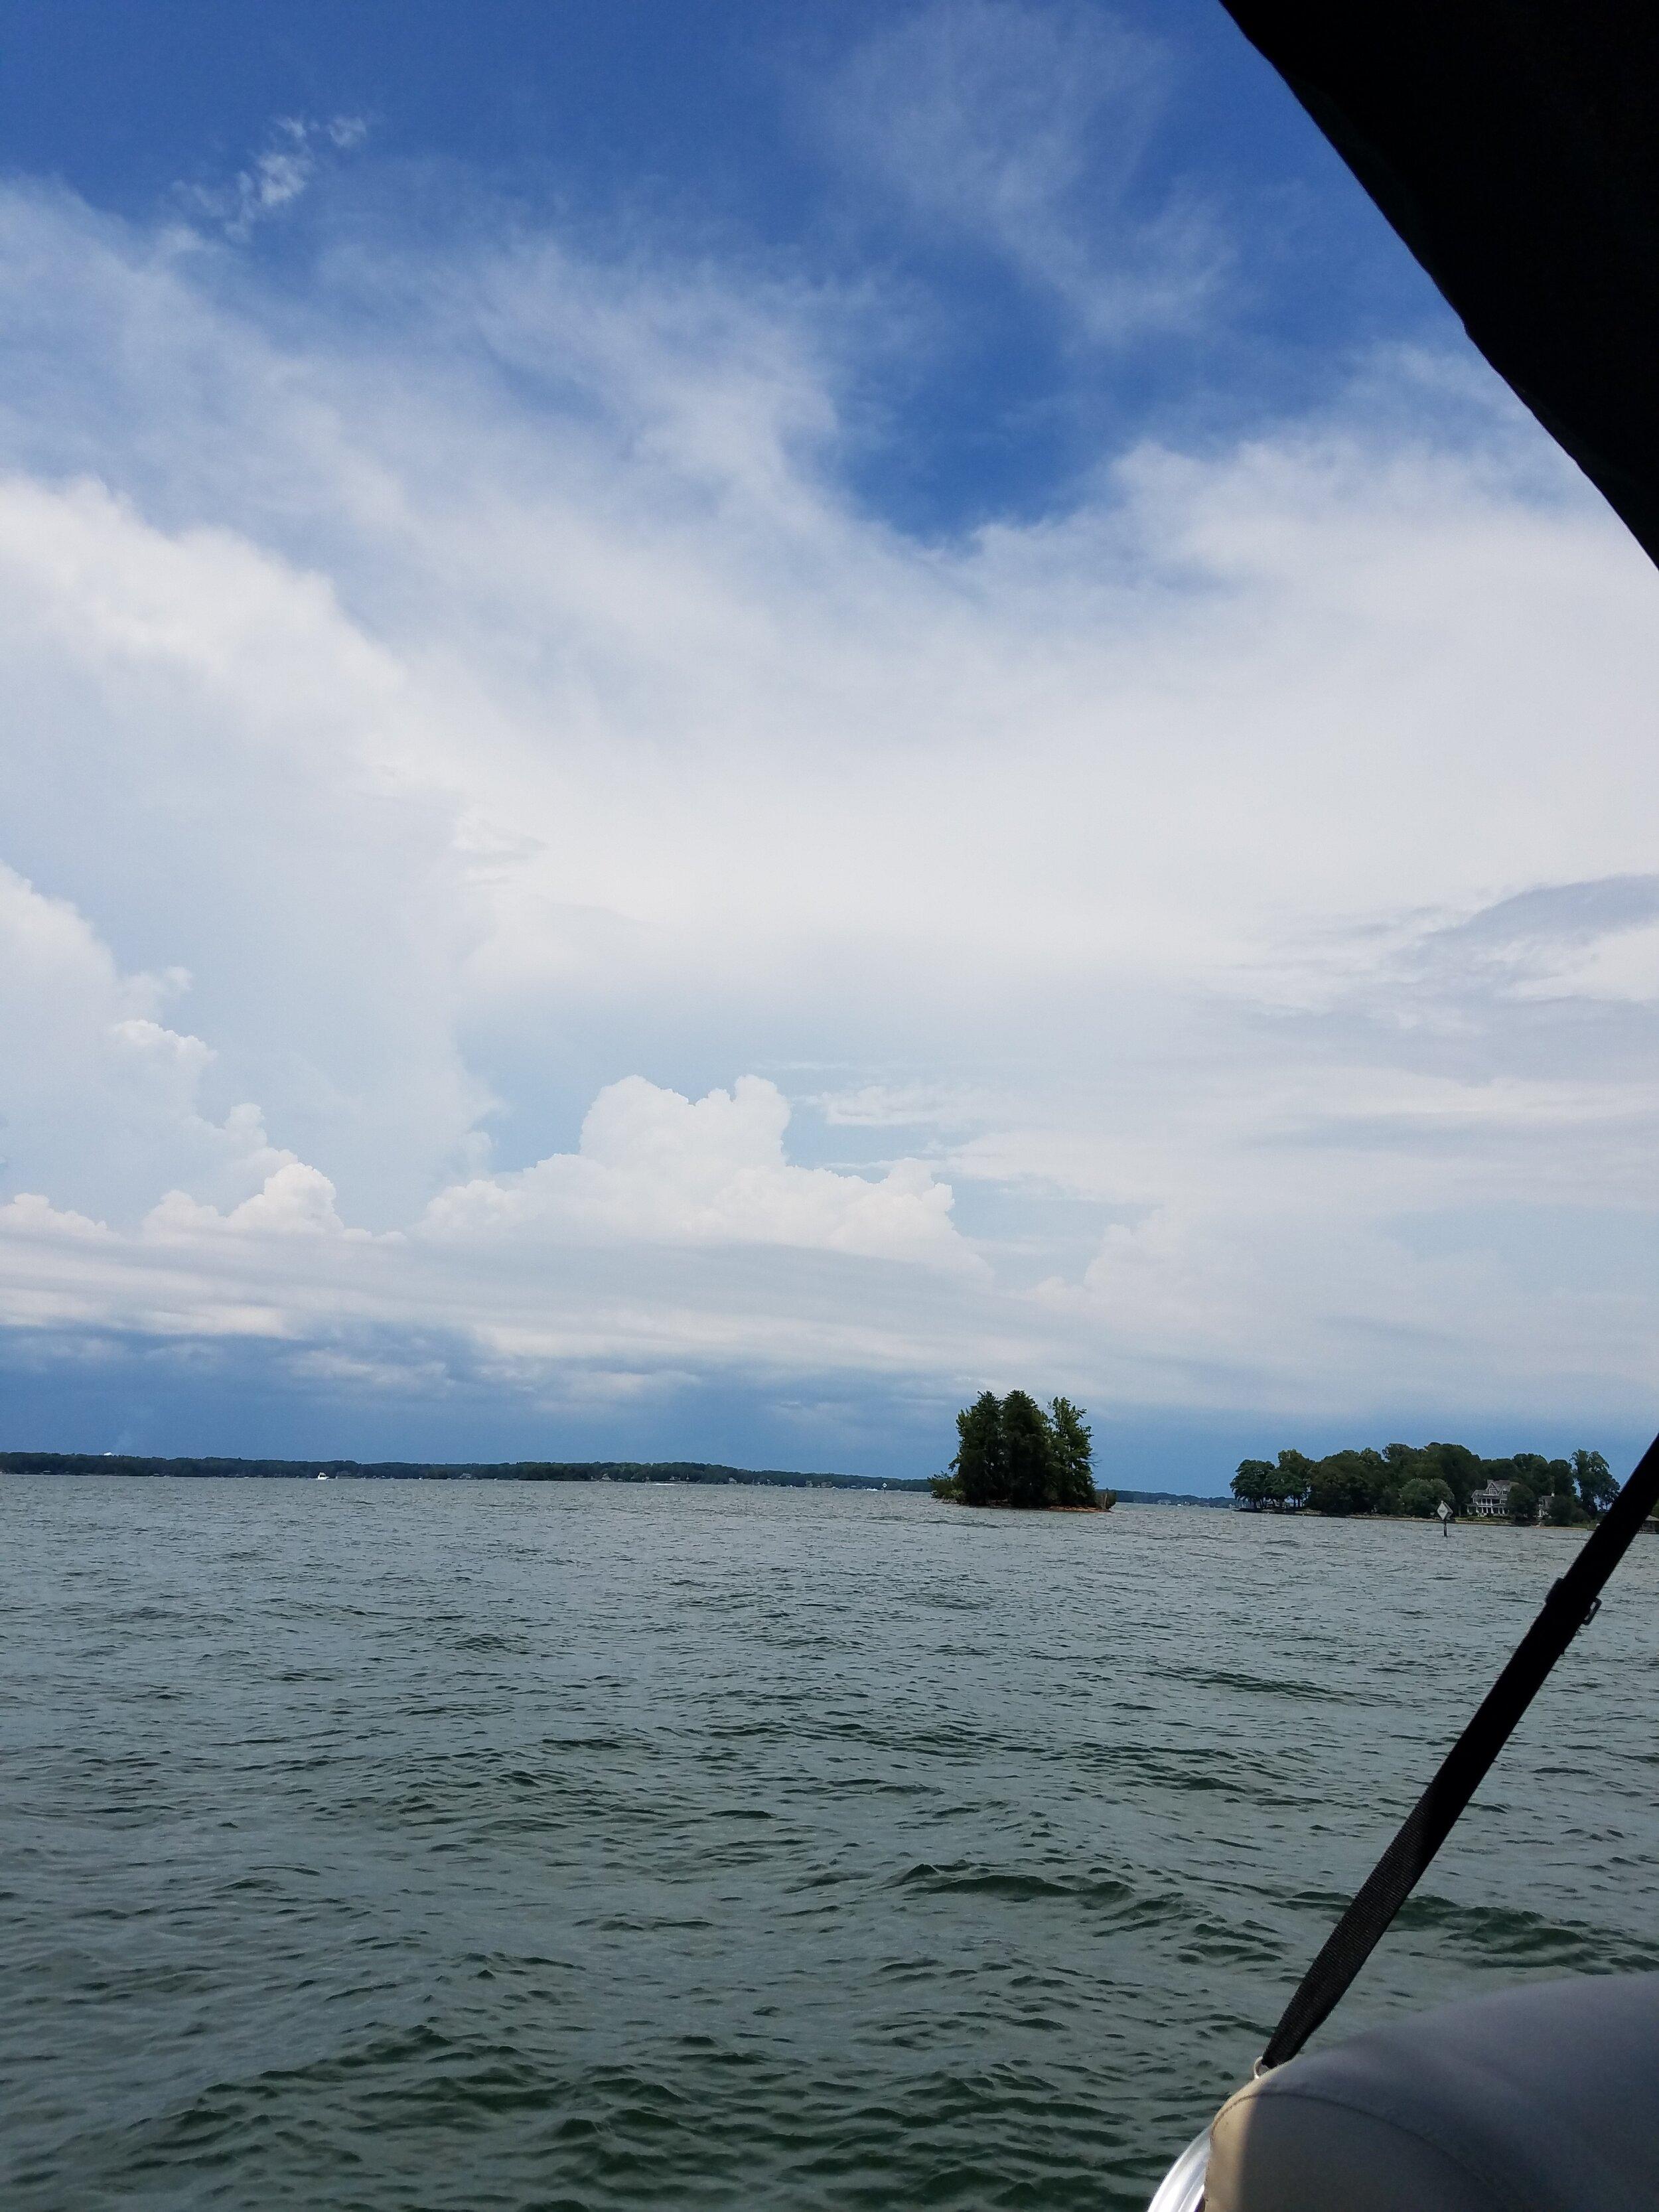 On a boat in North Carolina.